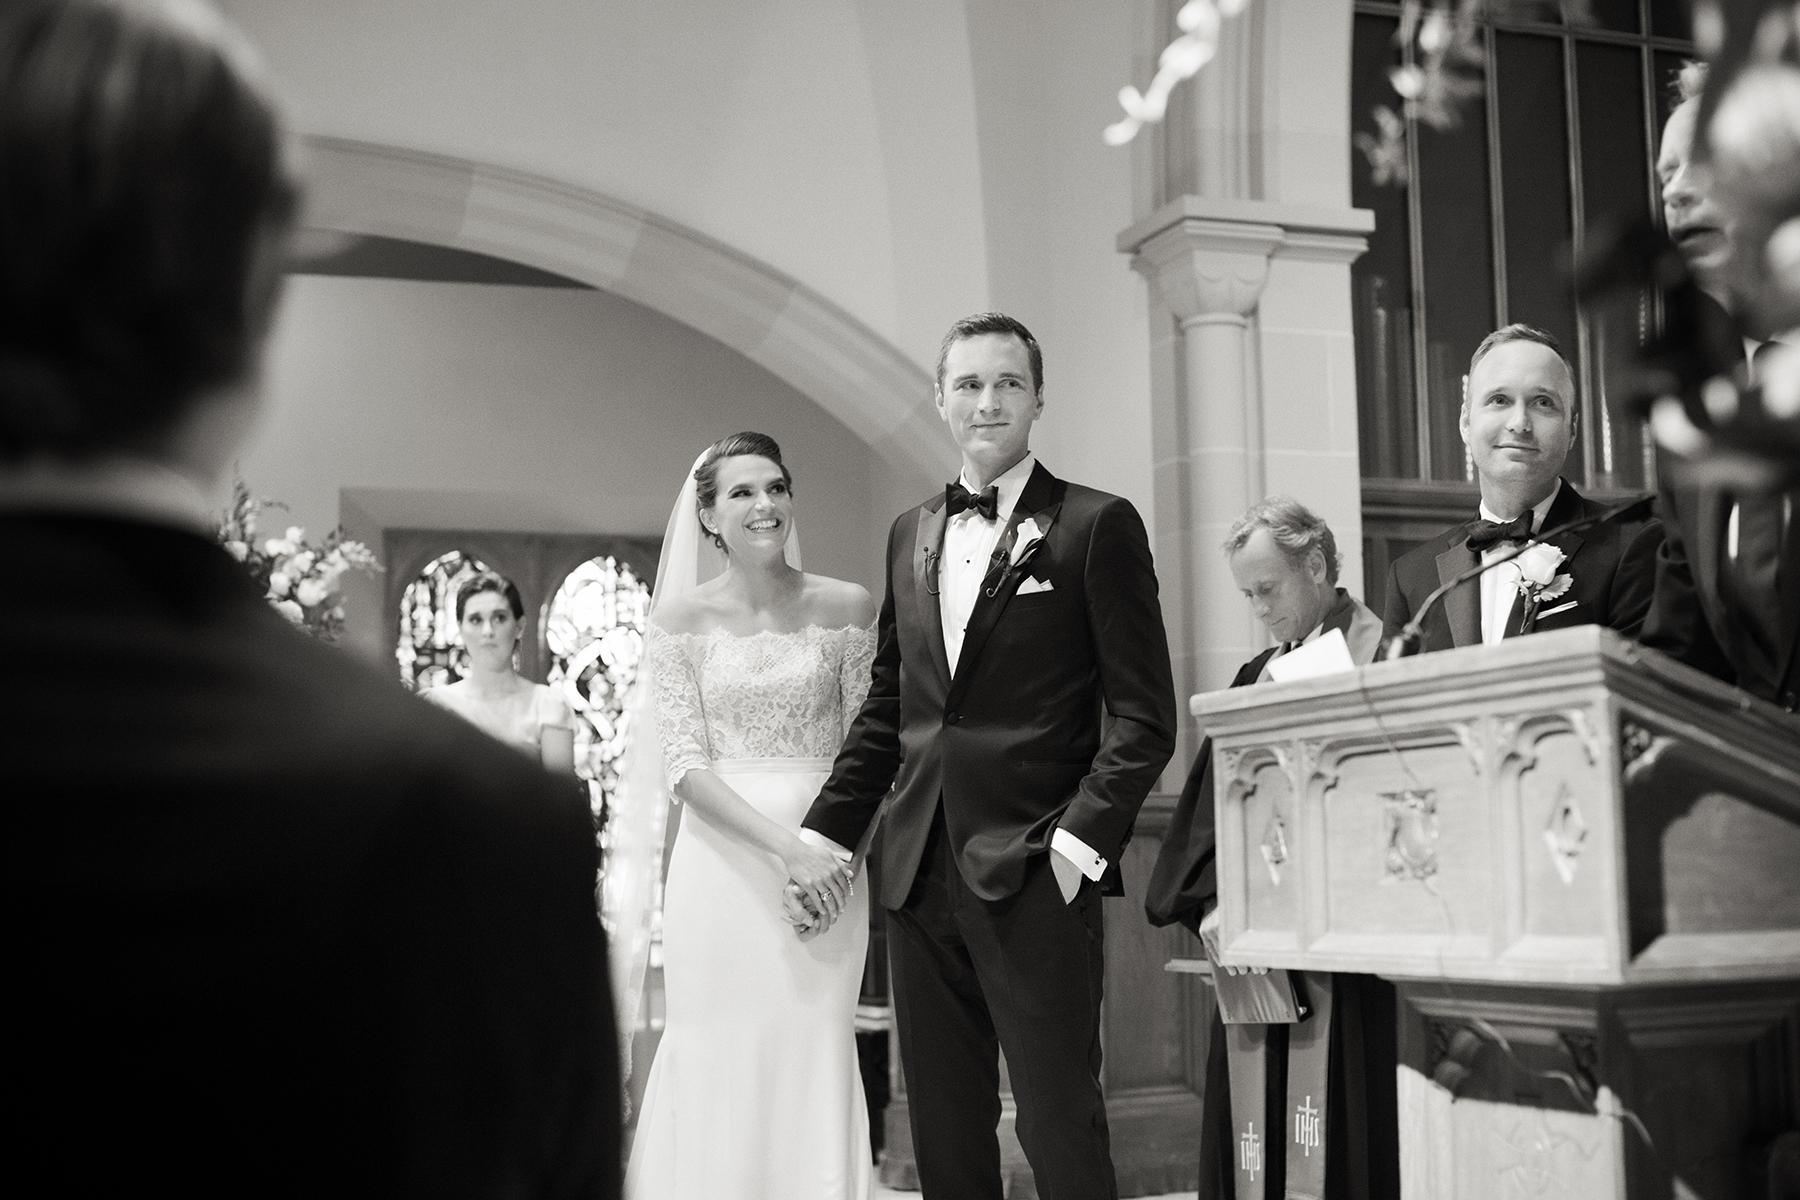 raquelreis_wedding_photography_apawamisclub_037.jpg